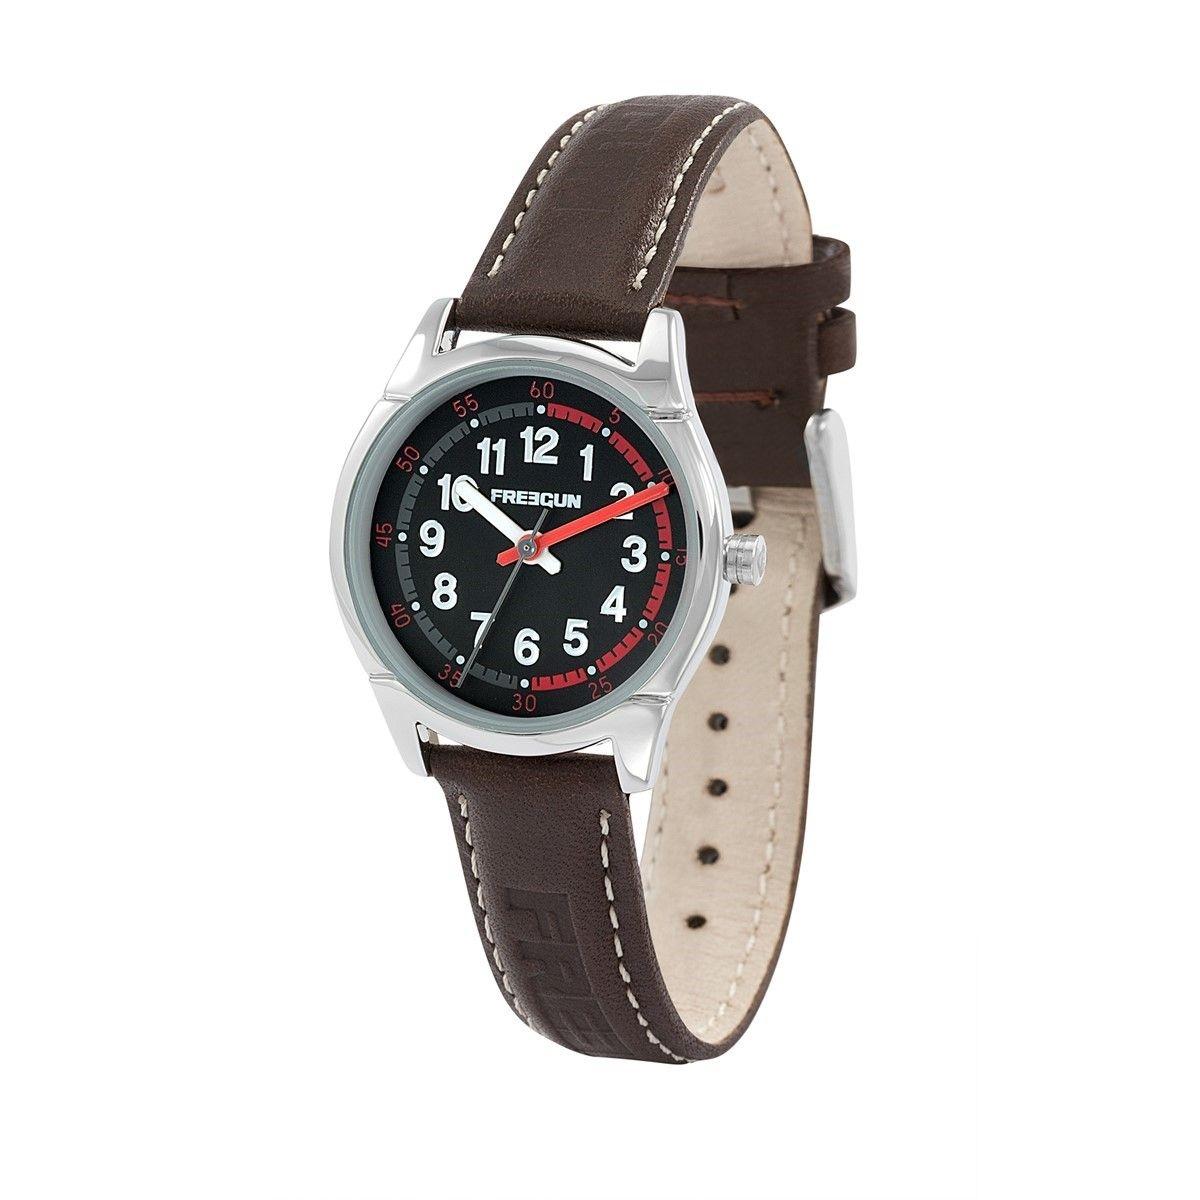 Montre garçon analogique bracelet cuir boitier 29 mm Varial